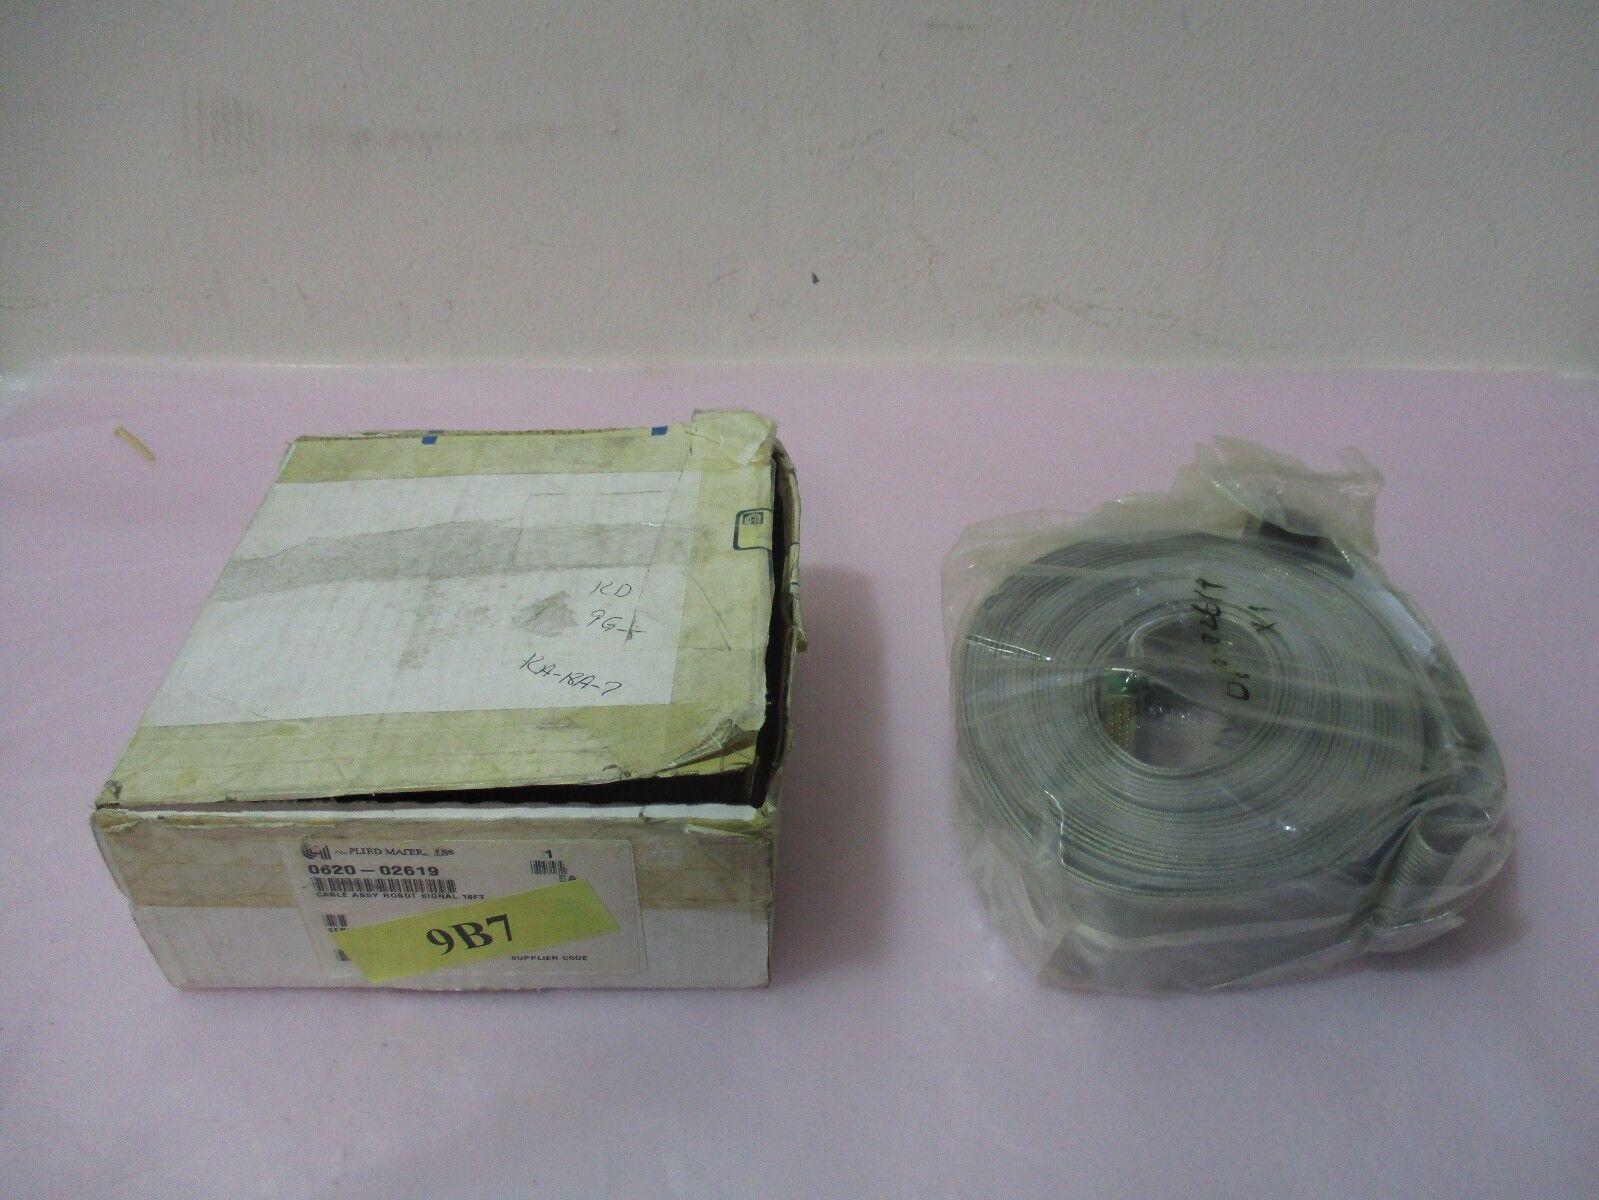 AMAT 0620-02619, 760J100-6, Cable Assembly, Robot Signal 18FT. 417894